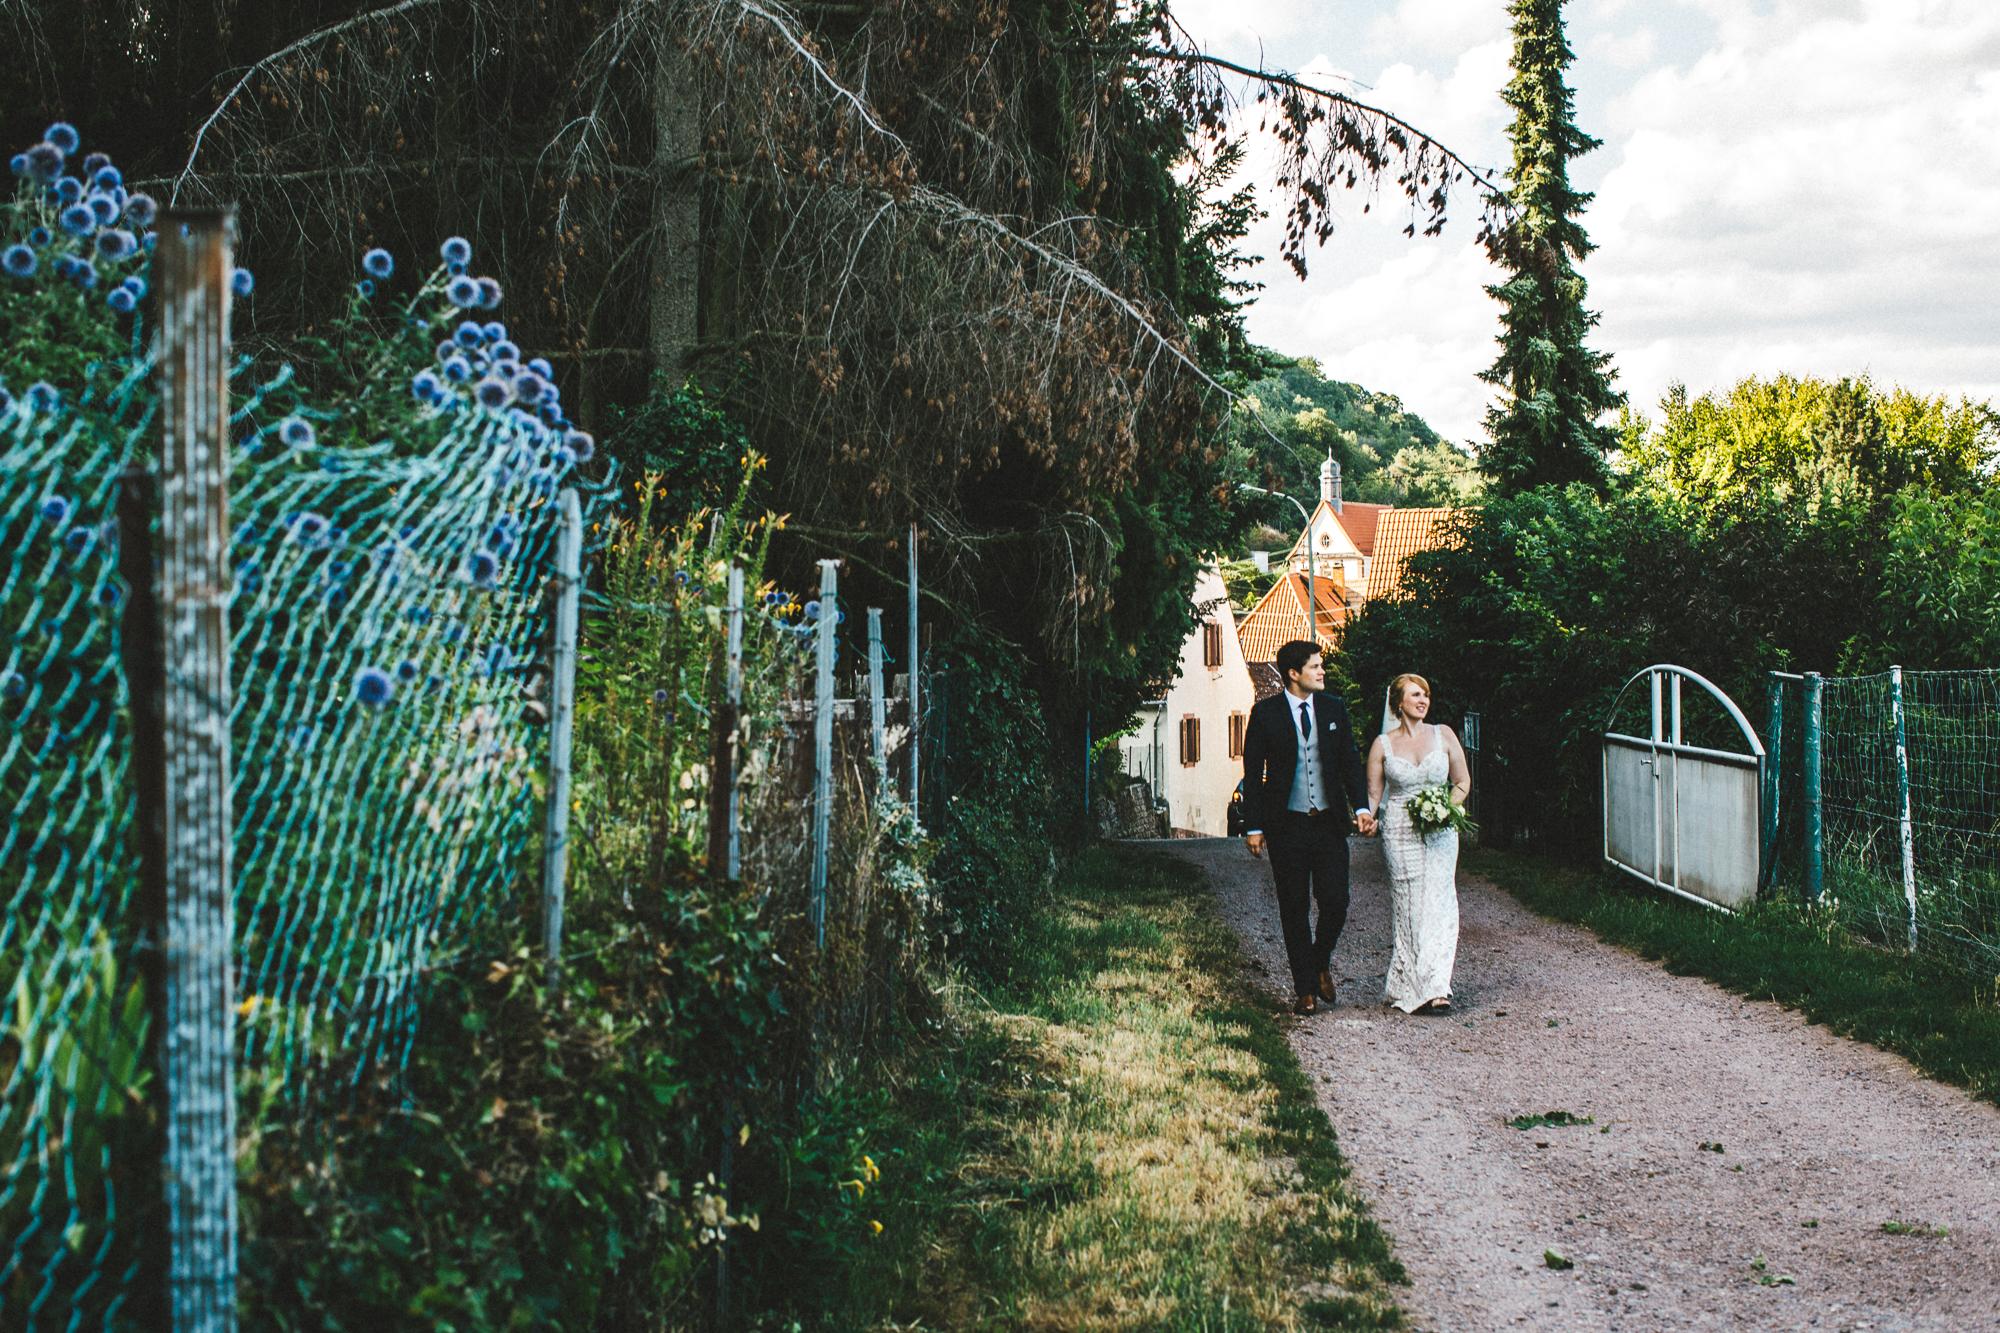 andreasweichel00060 - Neustadt Hambach